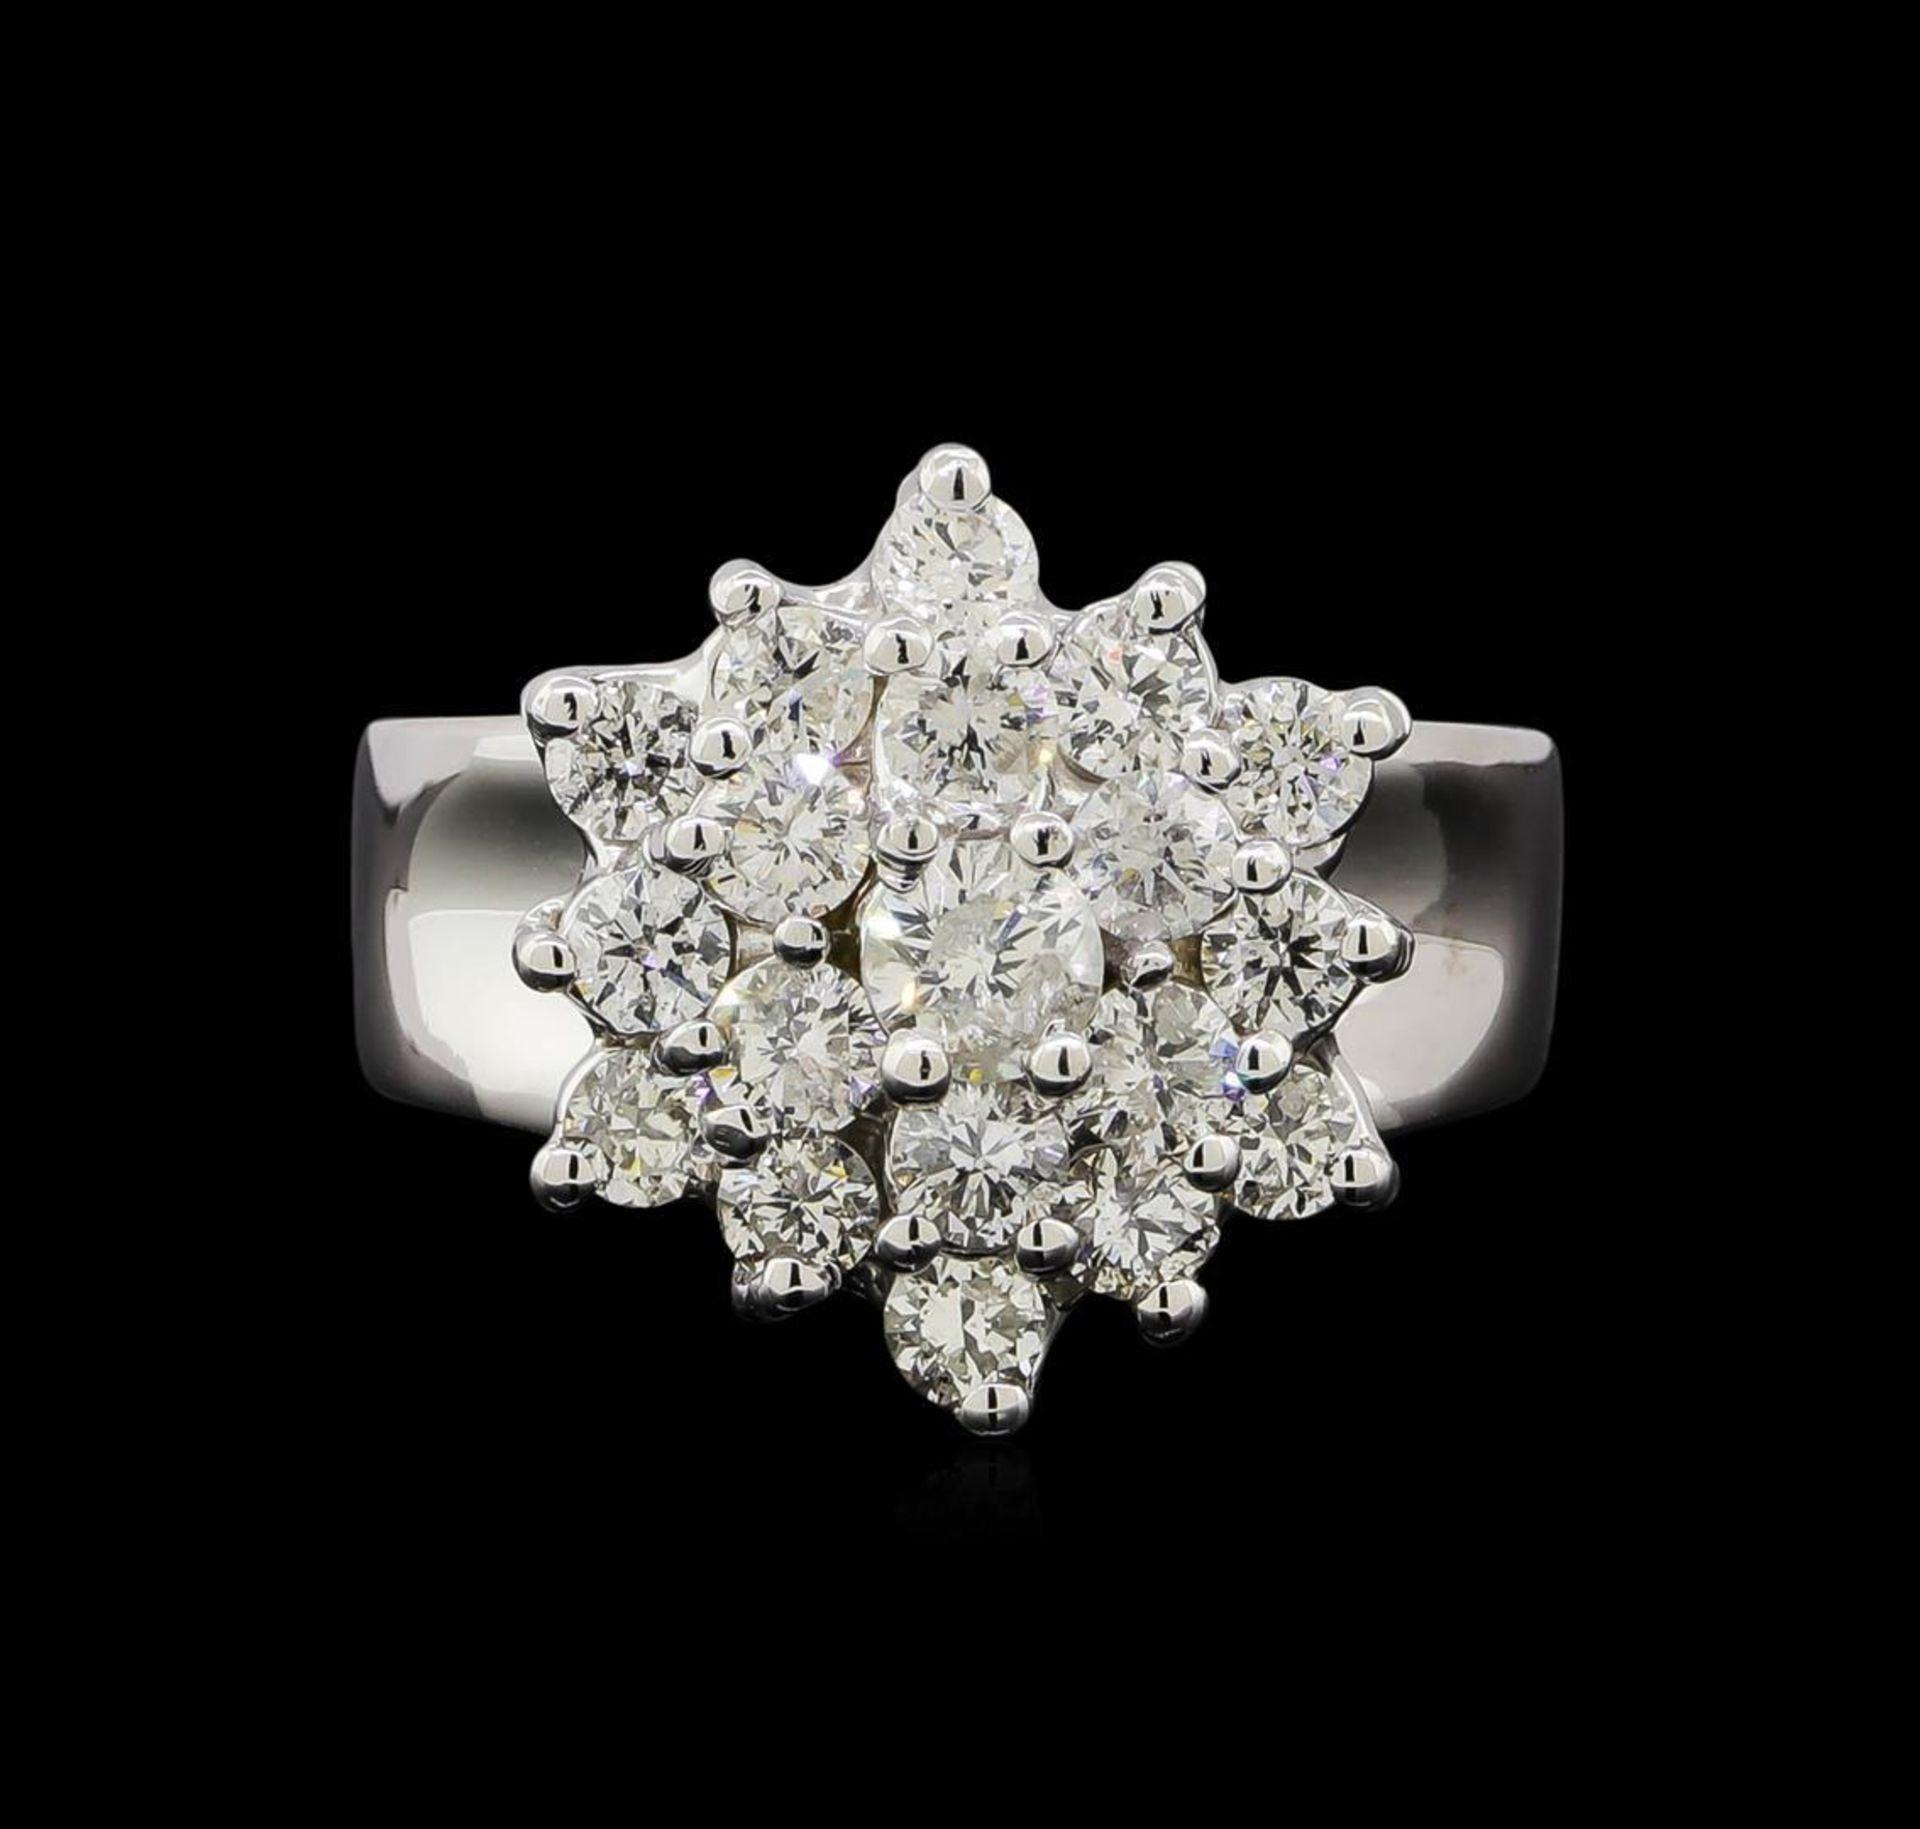 14KT White Gold 1.55 ctw Diamond Ring - Image 2 of 5